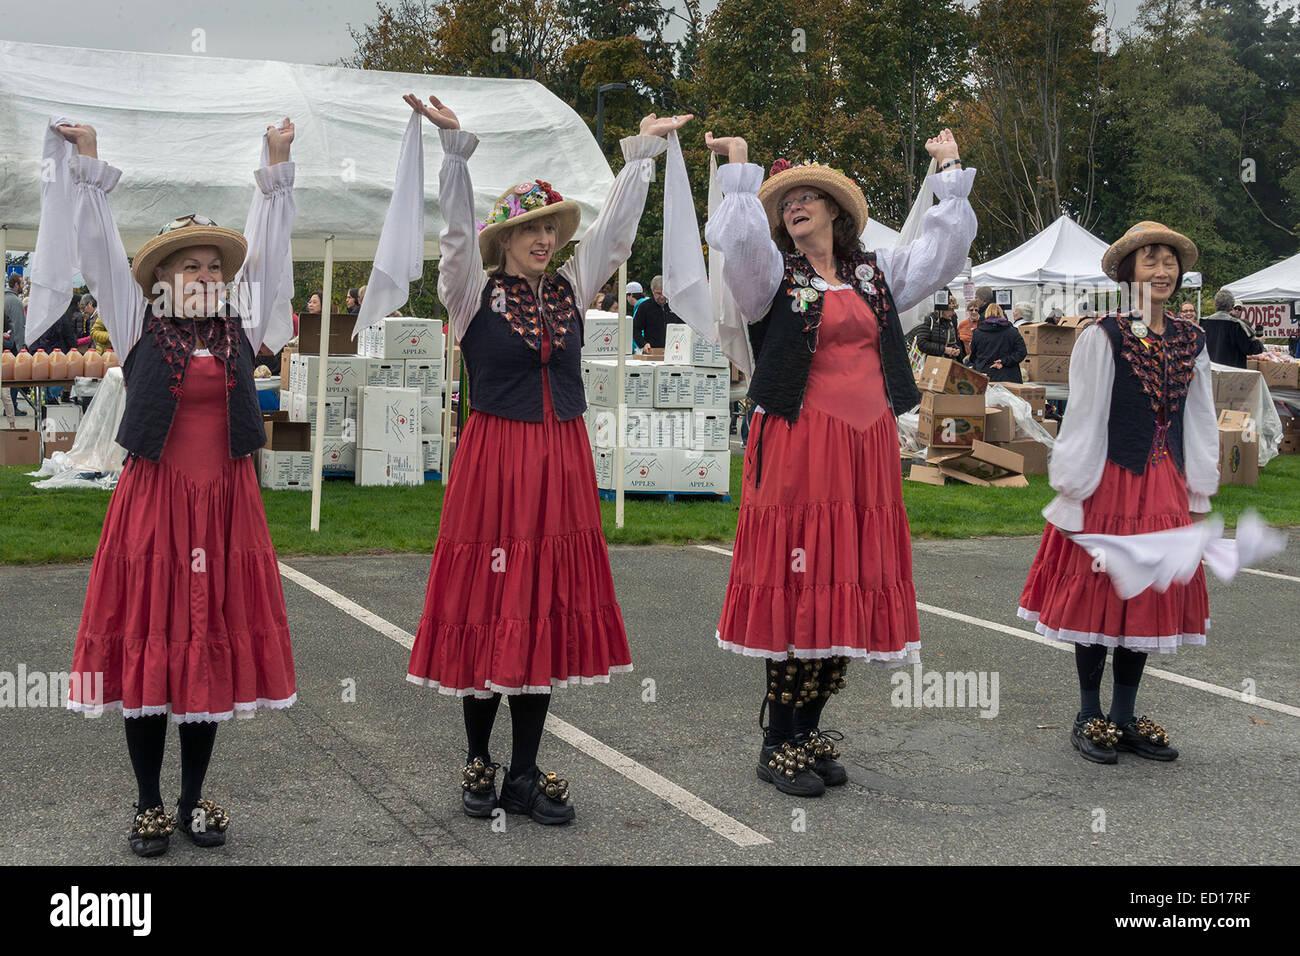 Morris dancers #8, Vancouver, British Columbia, Canada - Stock Image